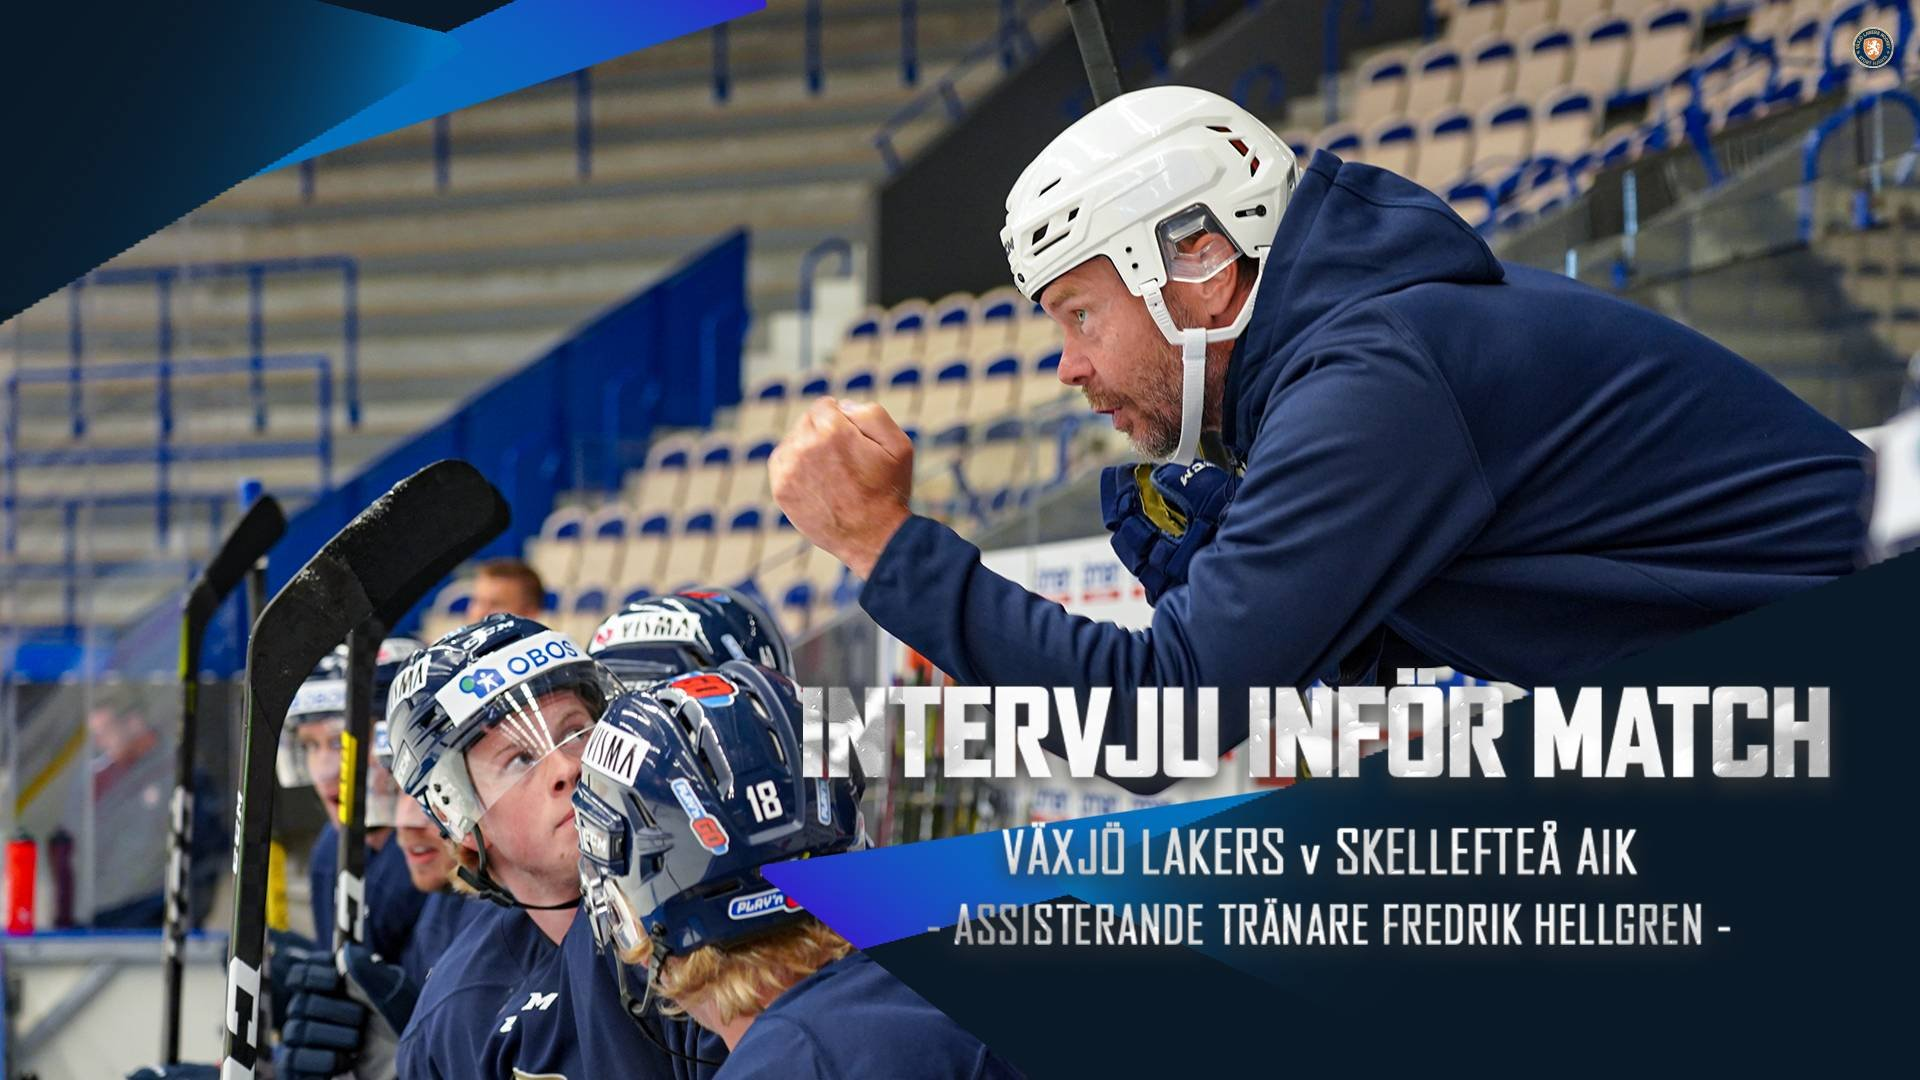 Coachintervju med Fredrik Hellgren